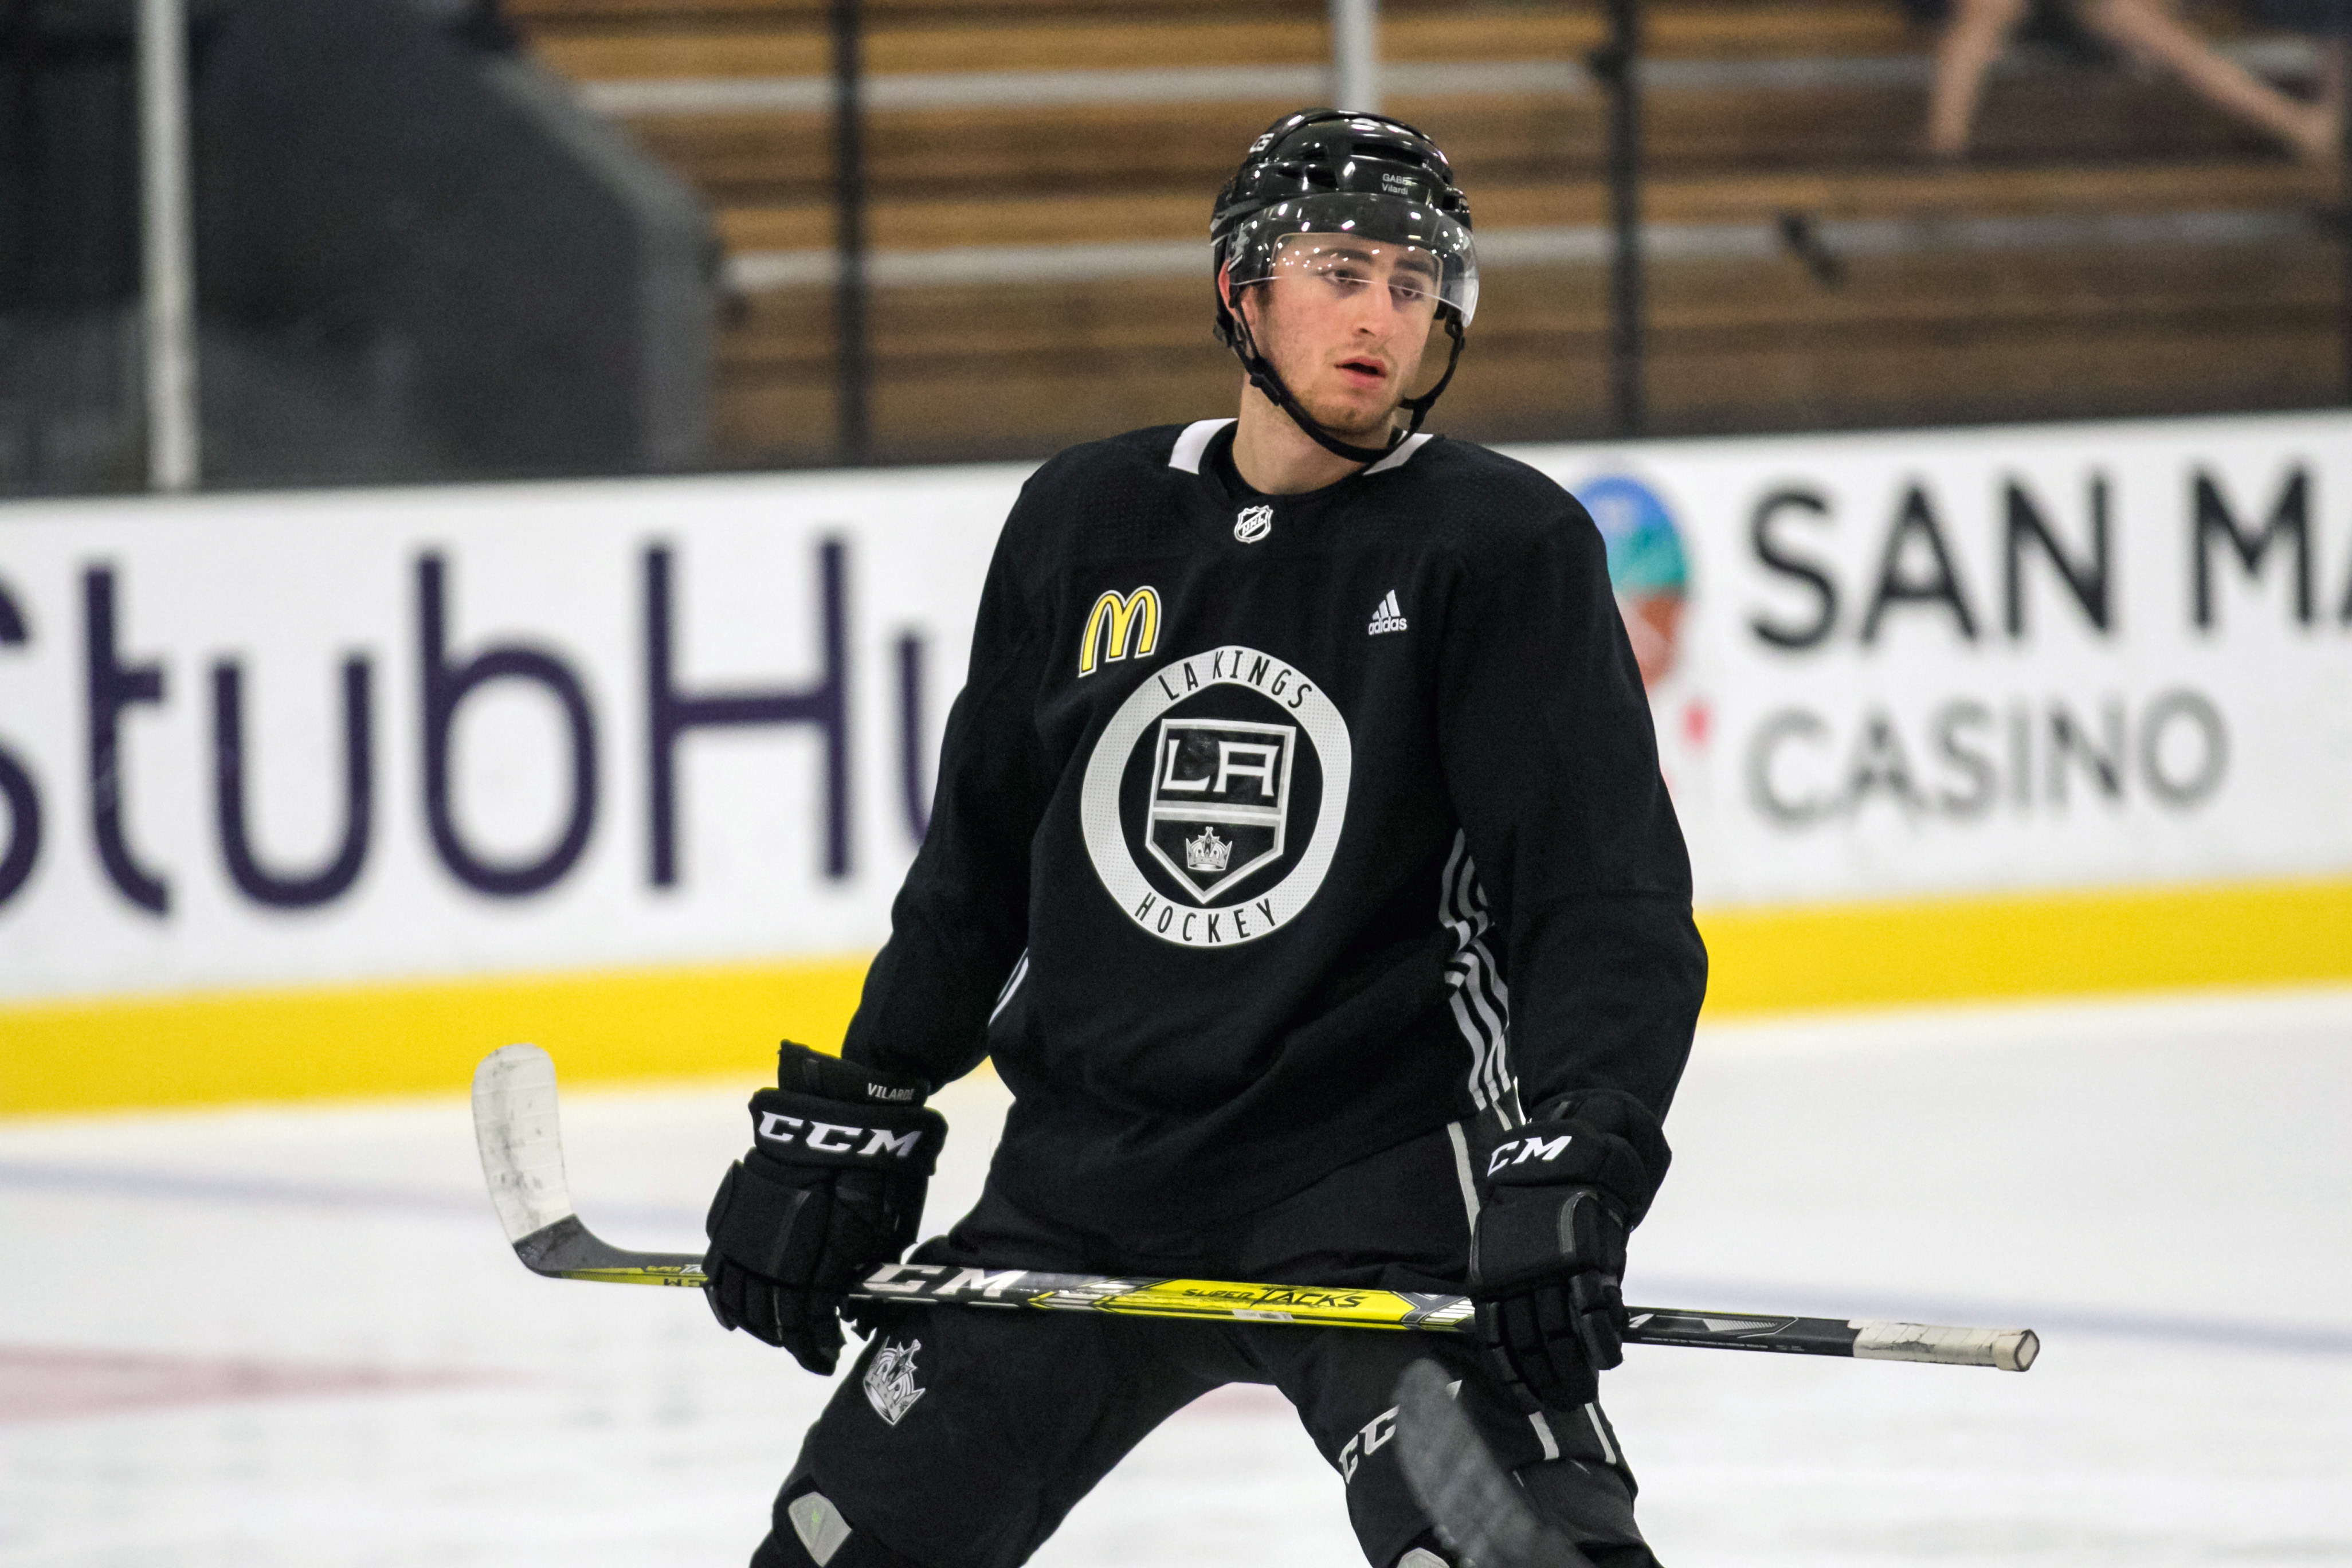 NHL: JUN 27 Kings Development Camp